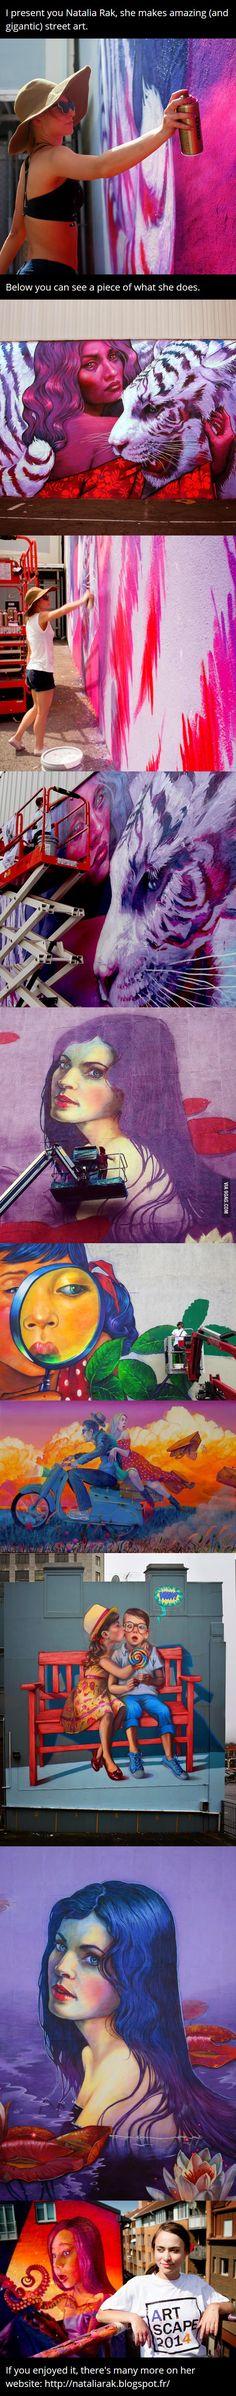 Natalia Rak, she makes street art - 9GAG